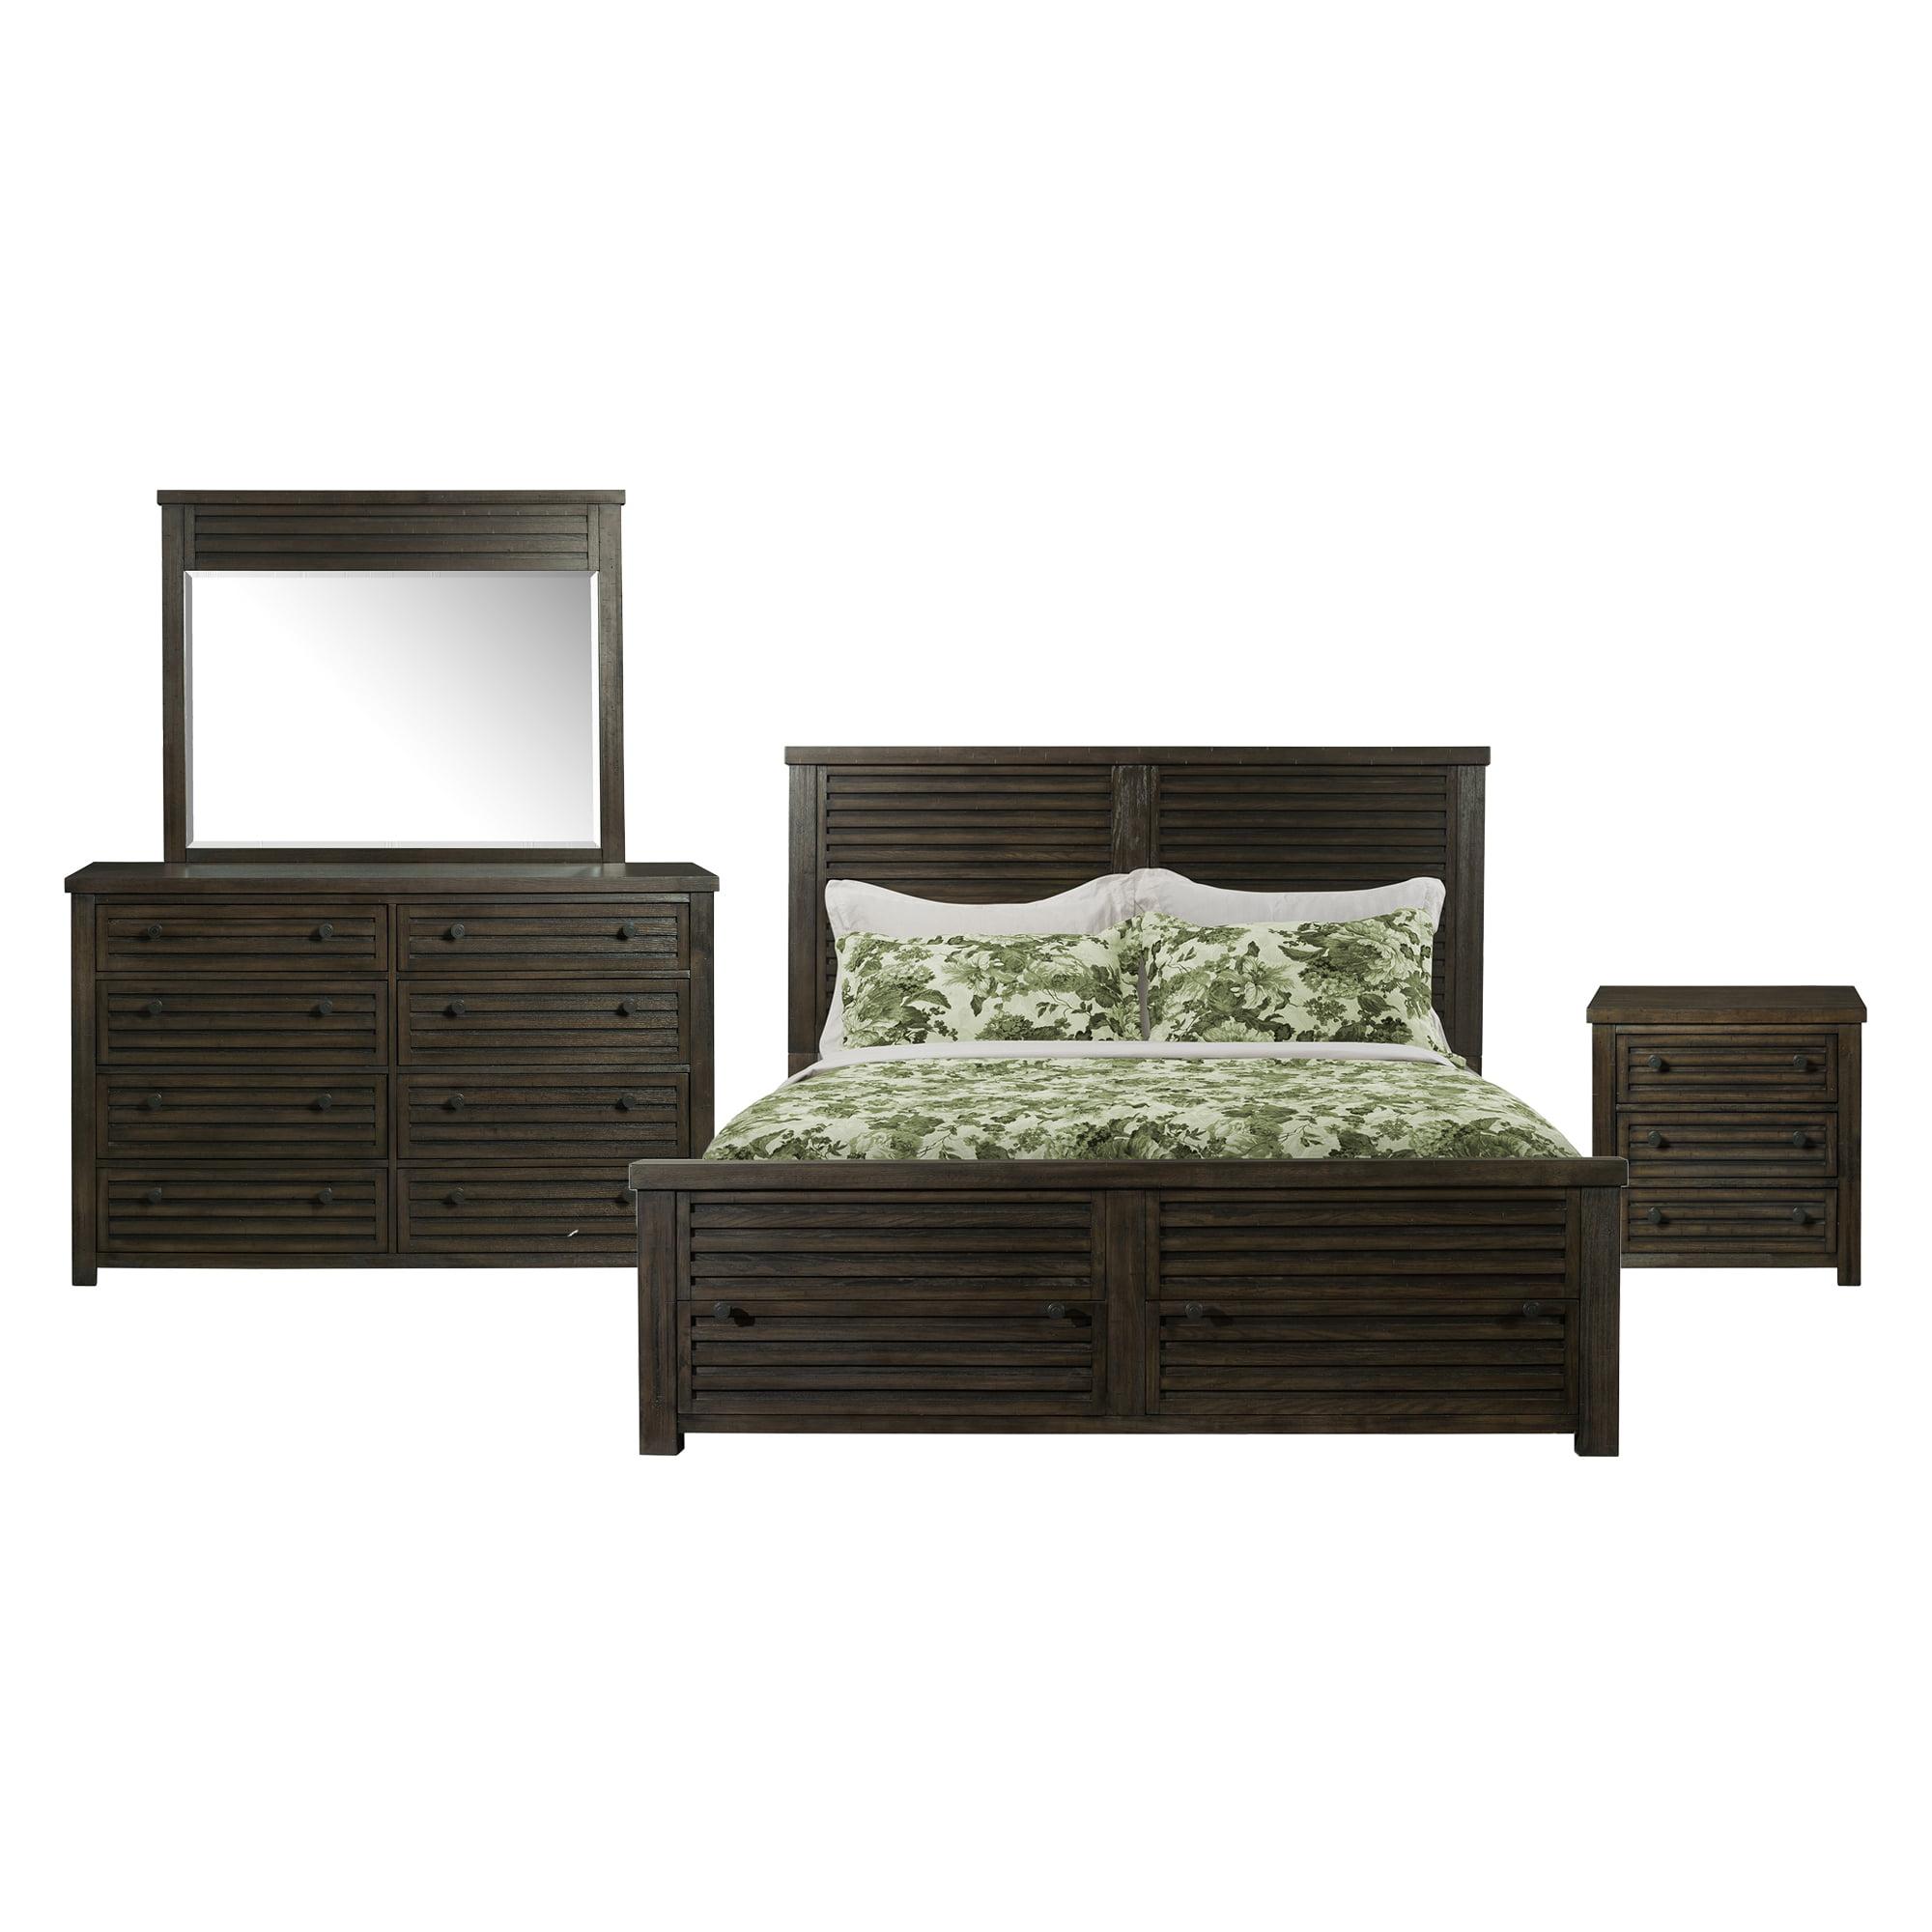 Picket House Furnishings Montego King Storage 4PC Bedroom Set